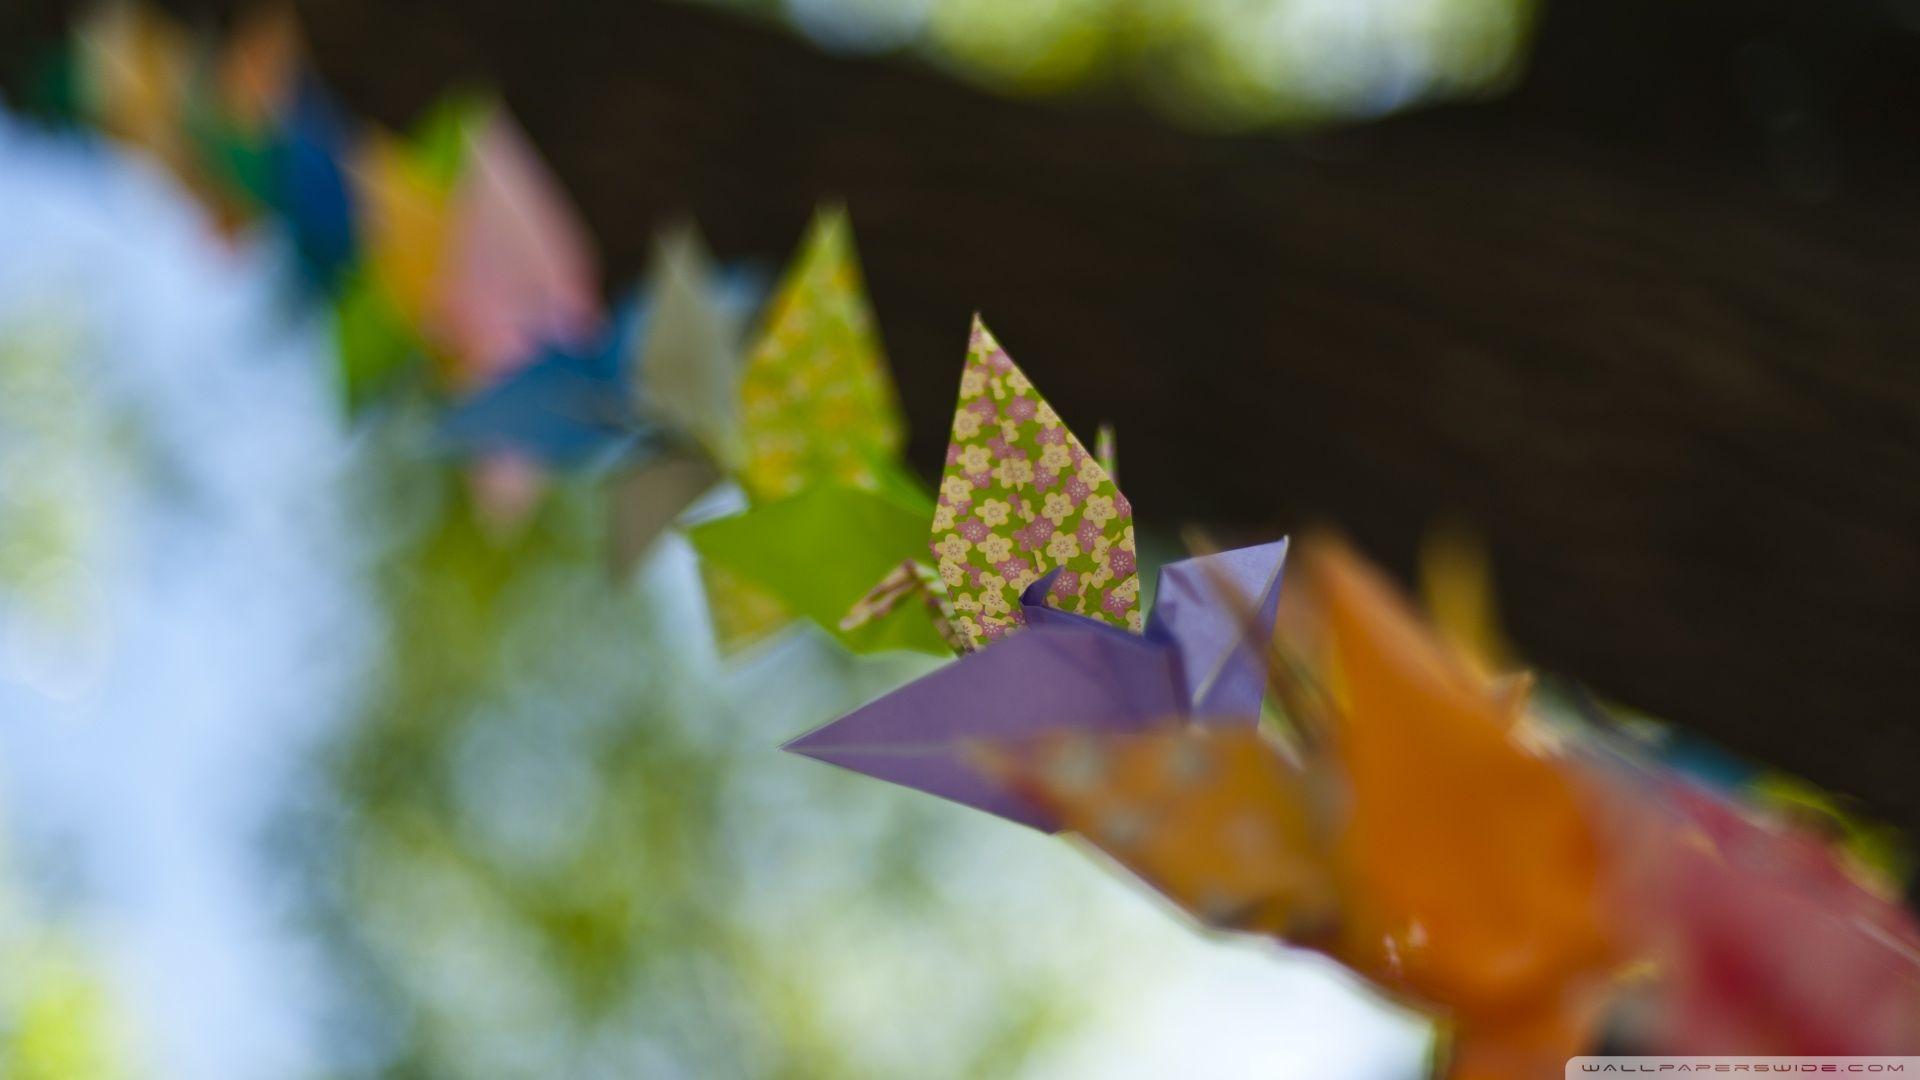 Origami good background